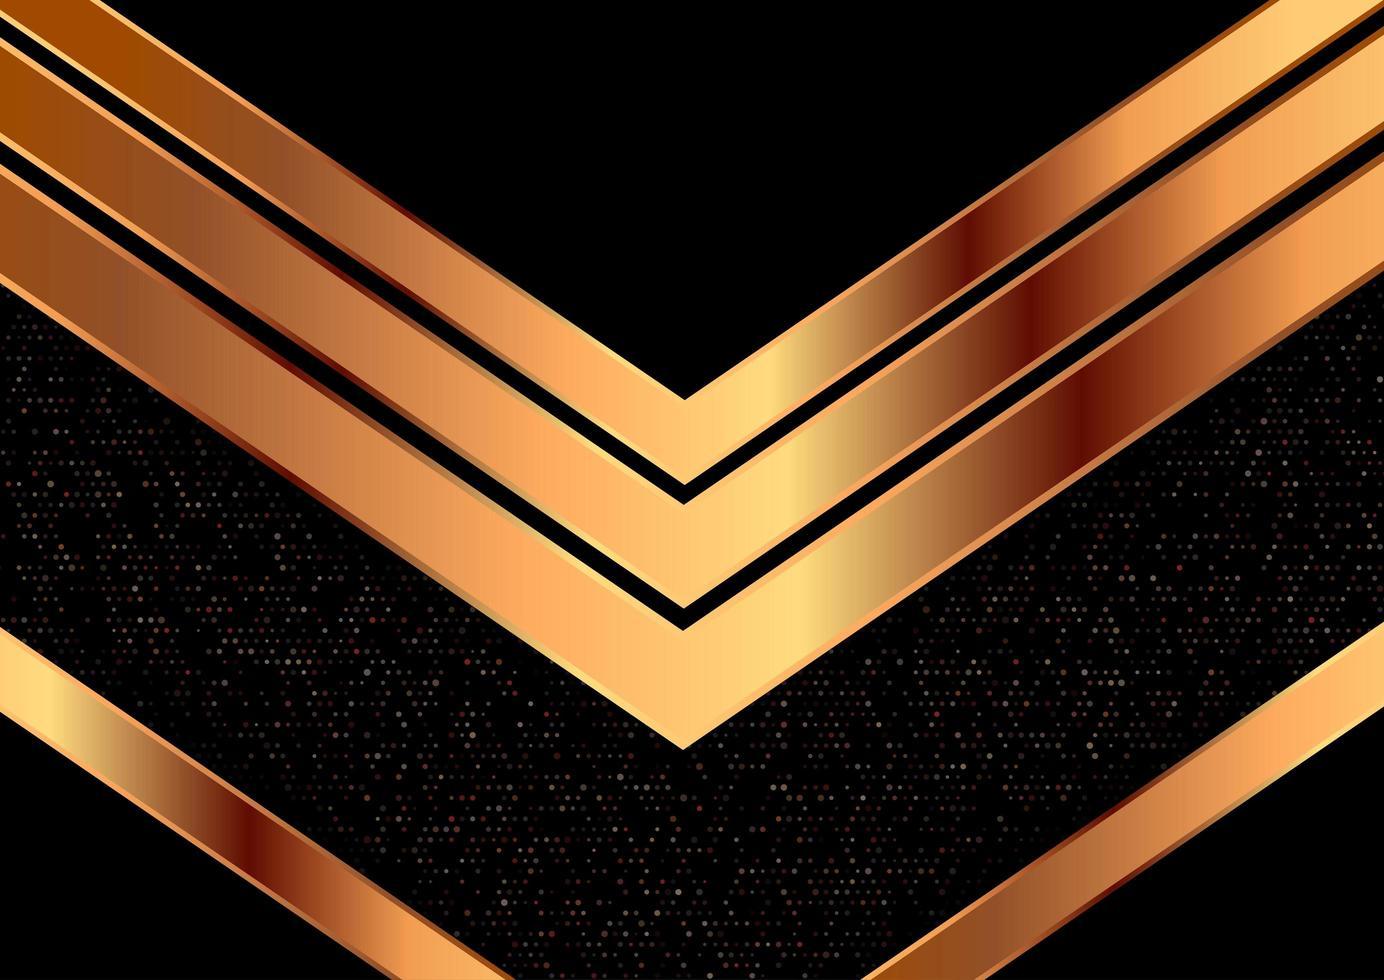 dekorativ gyllene pil metallisk design vektor